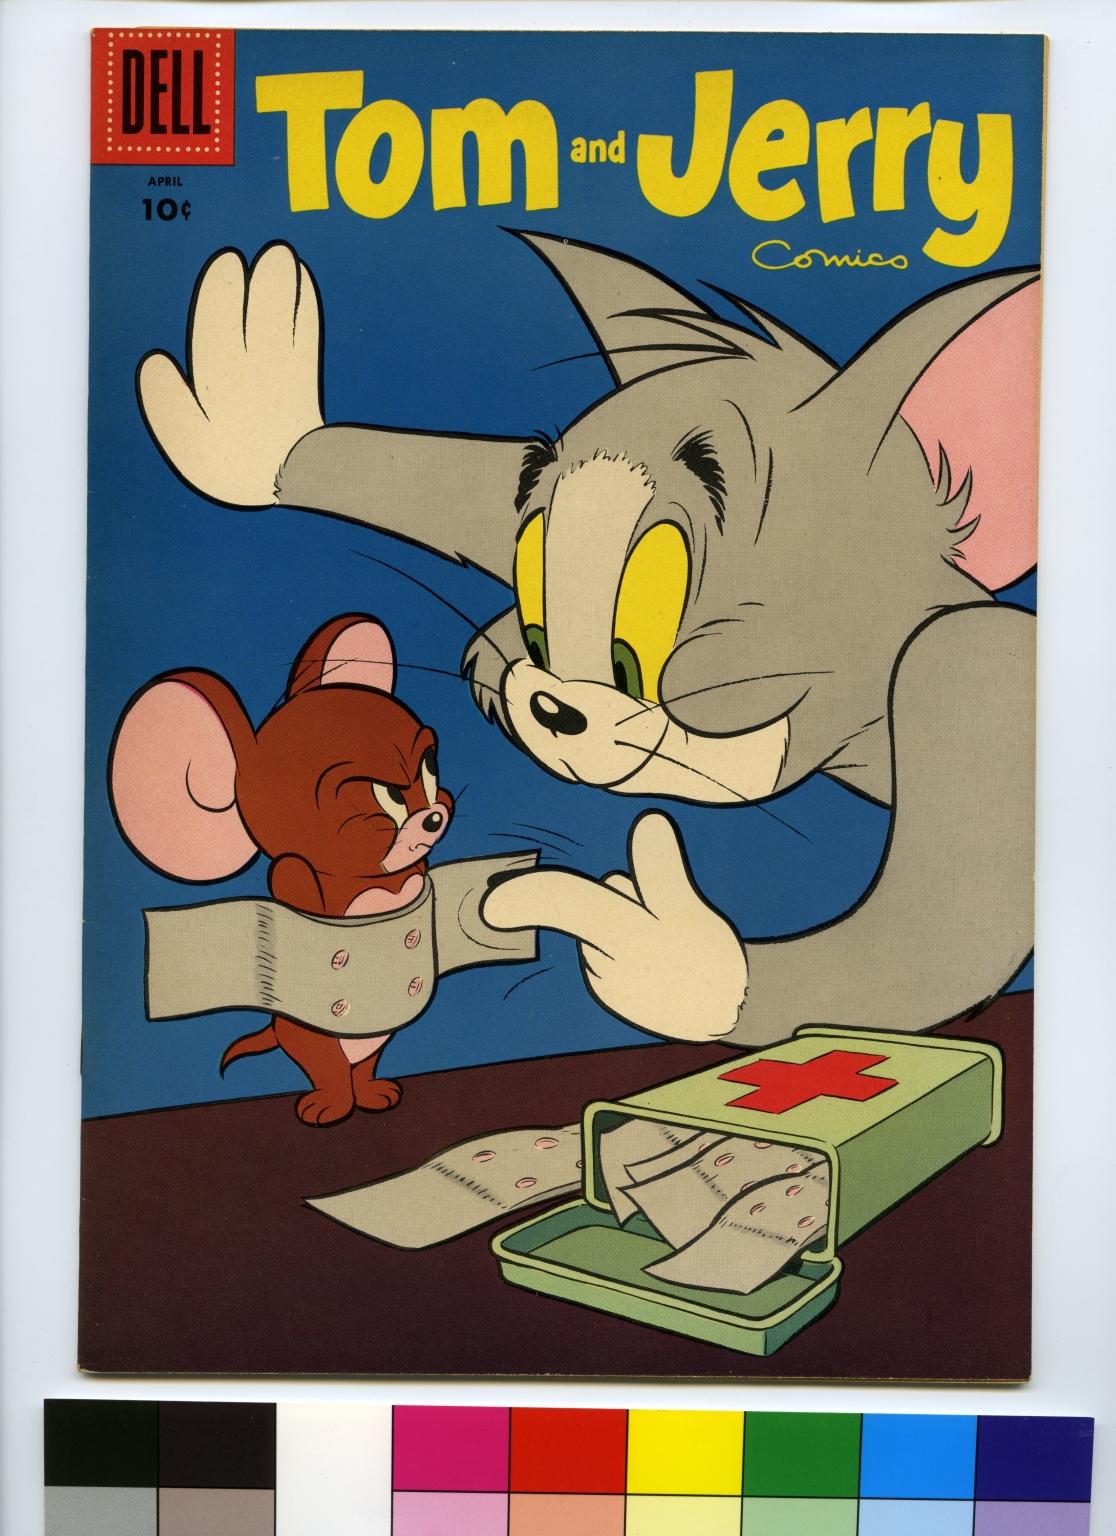 Tom and Jerry Comics